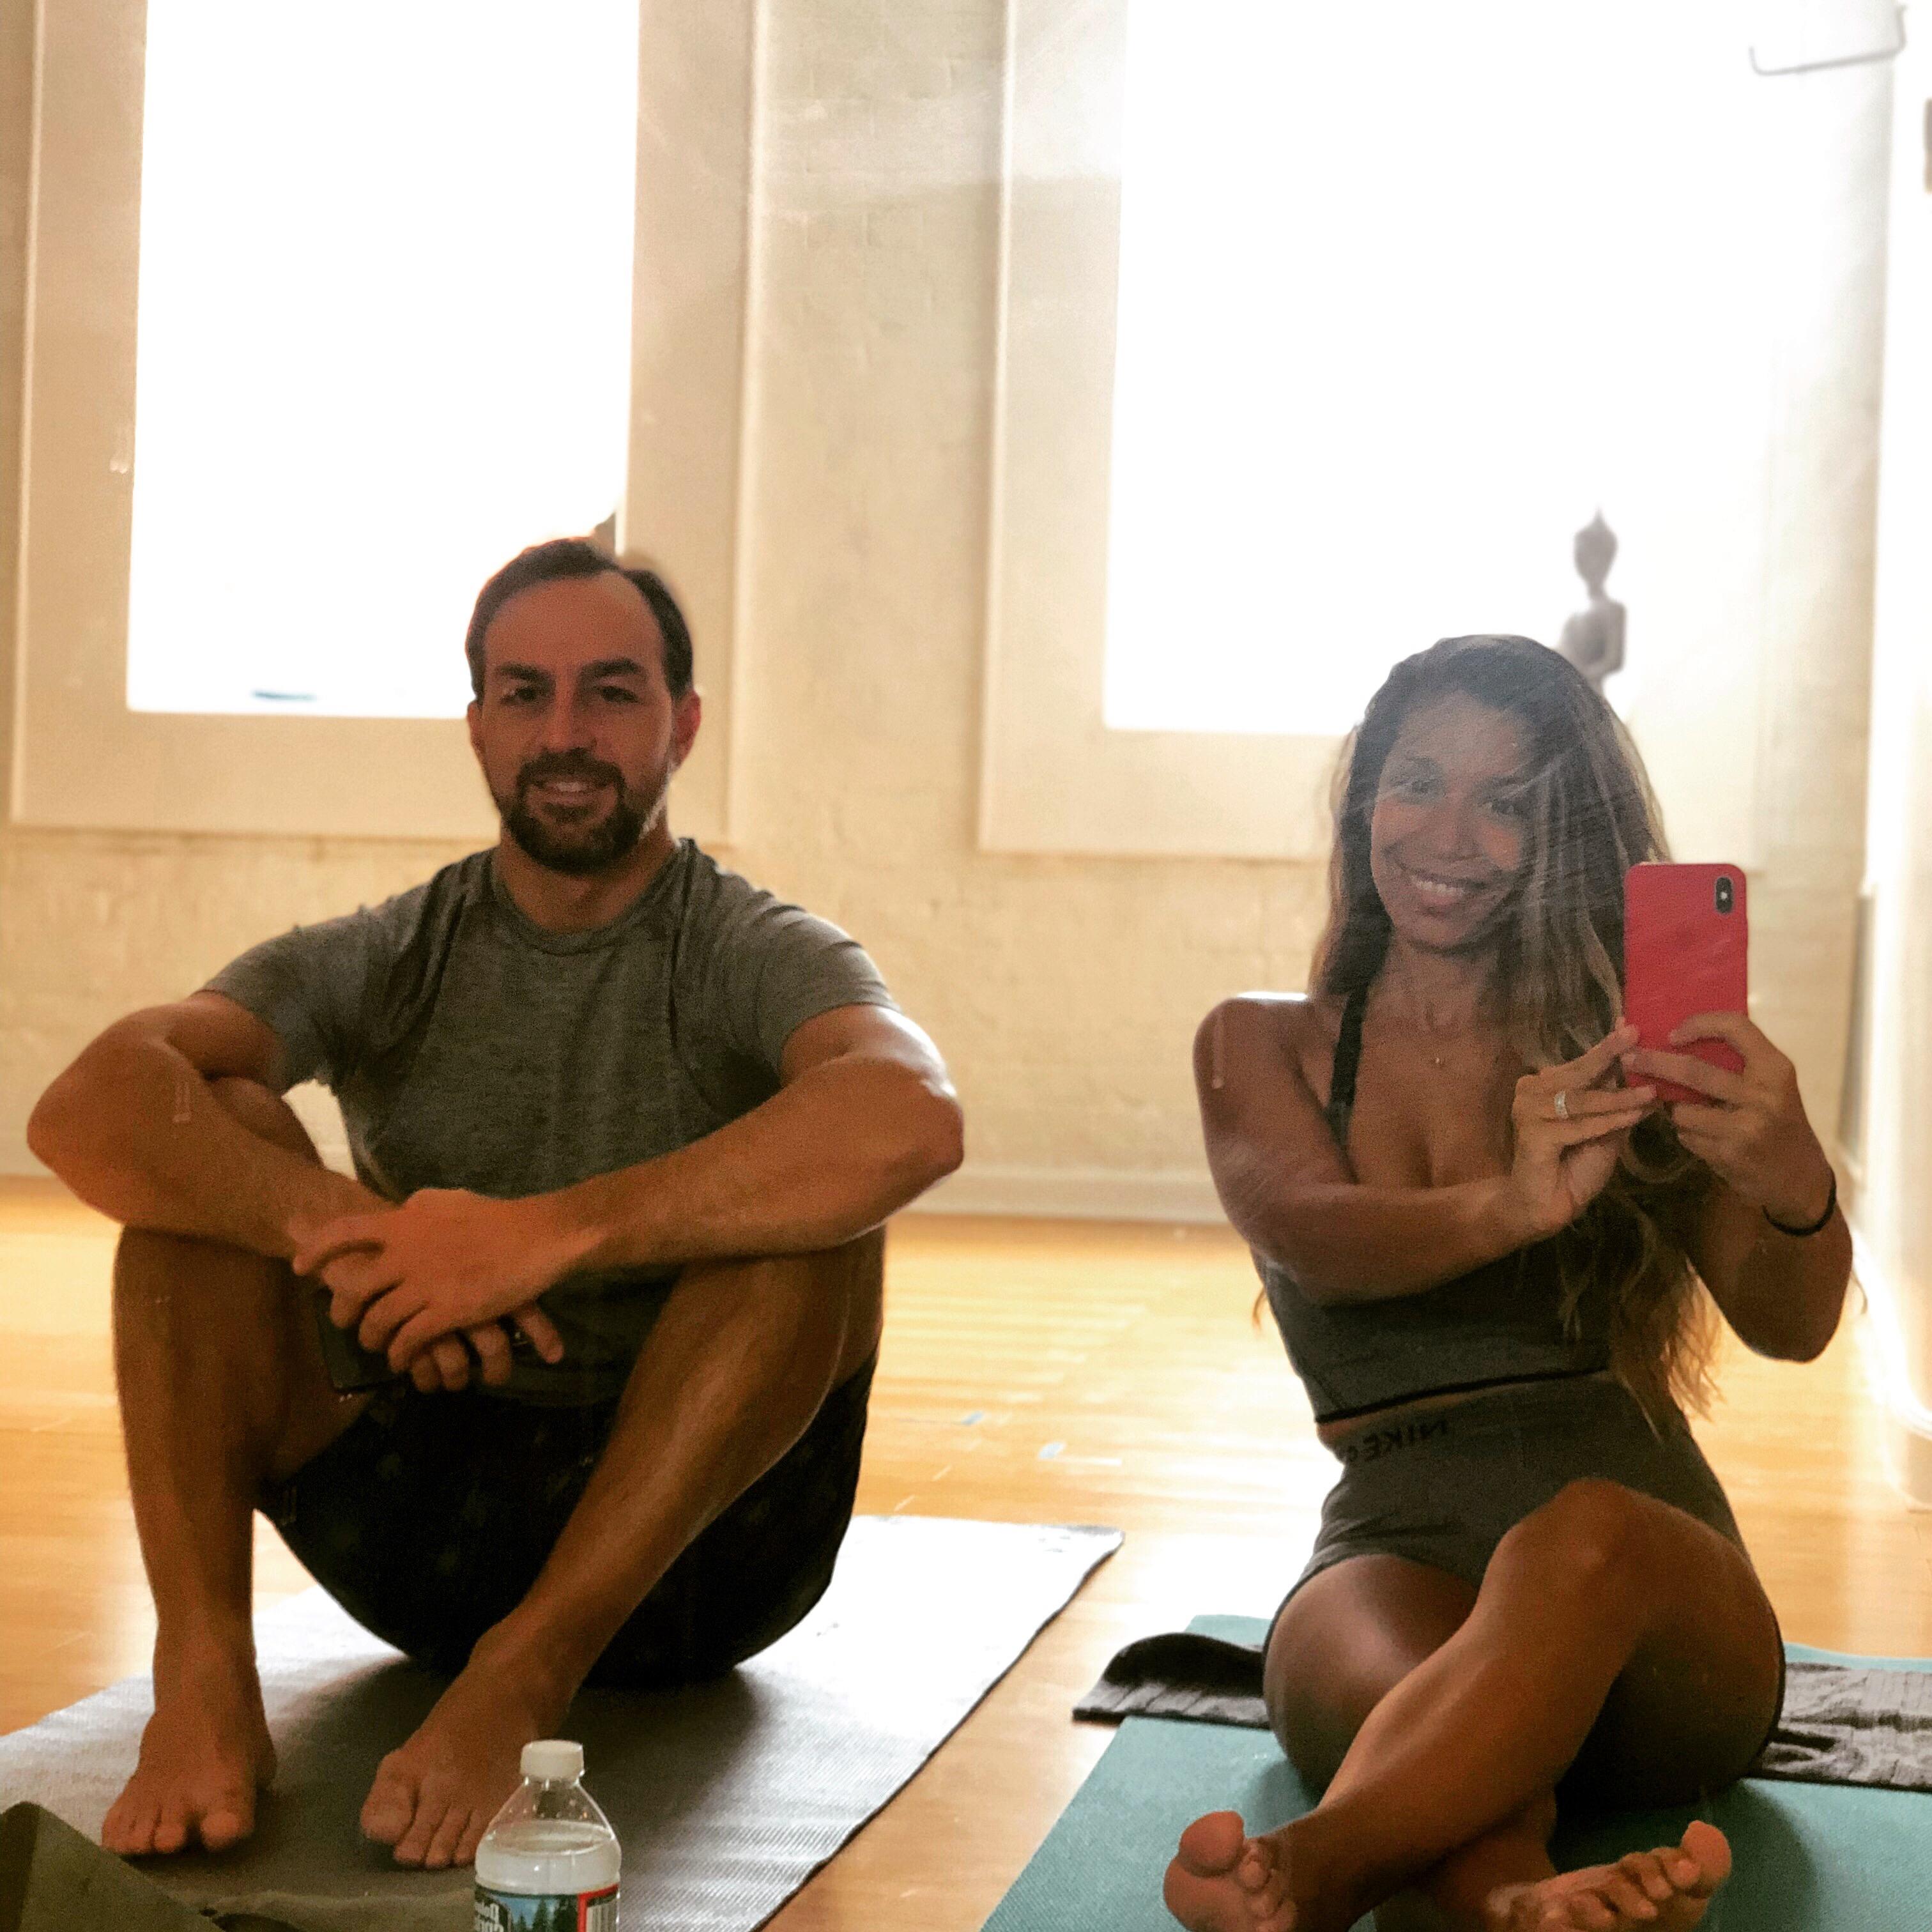 Hot Yoga Hot Wife